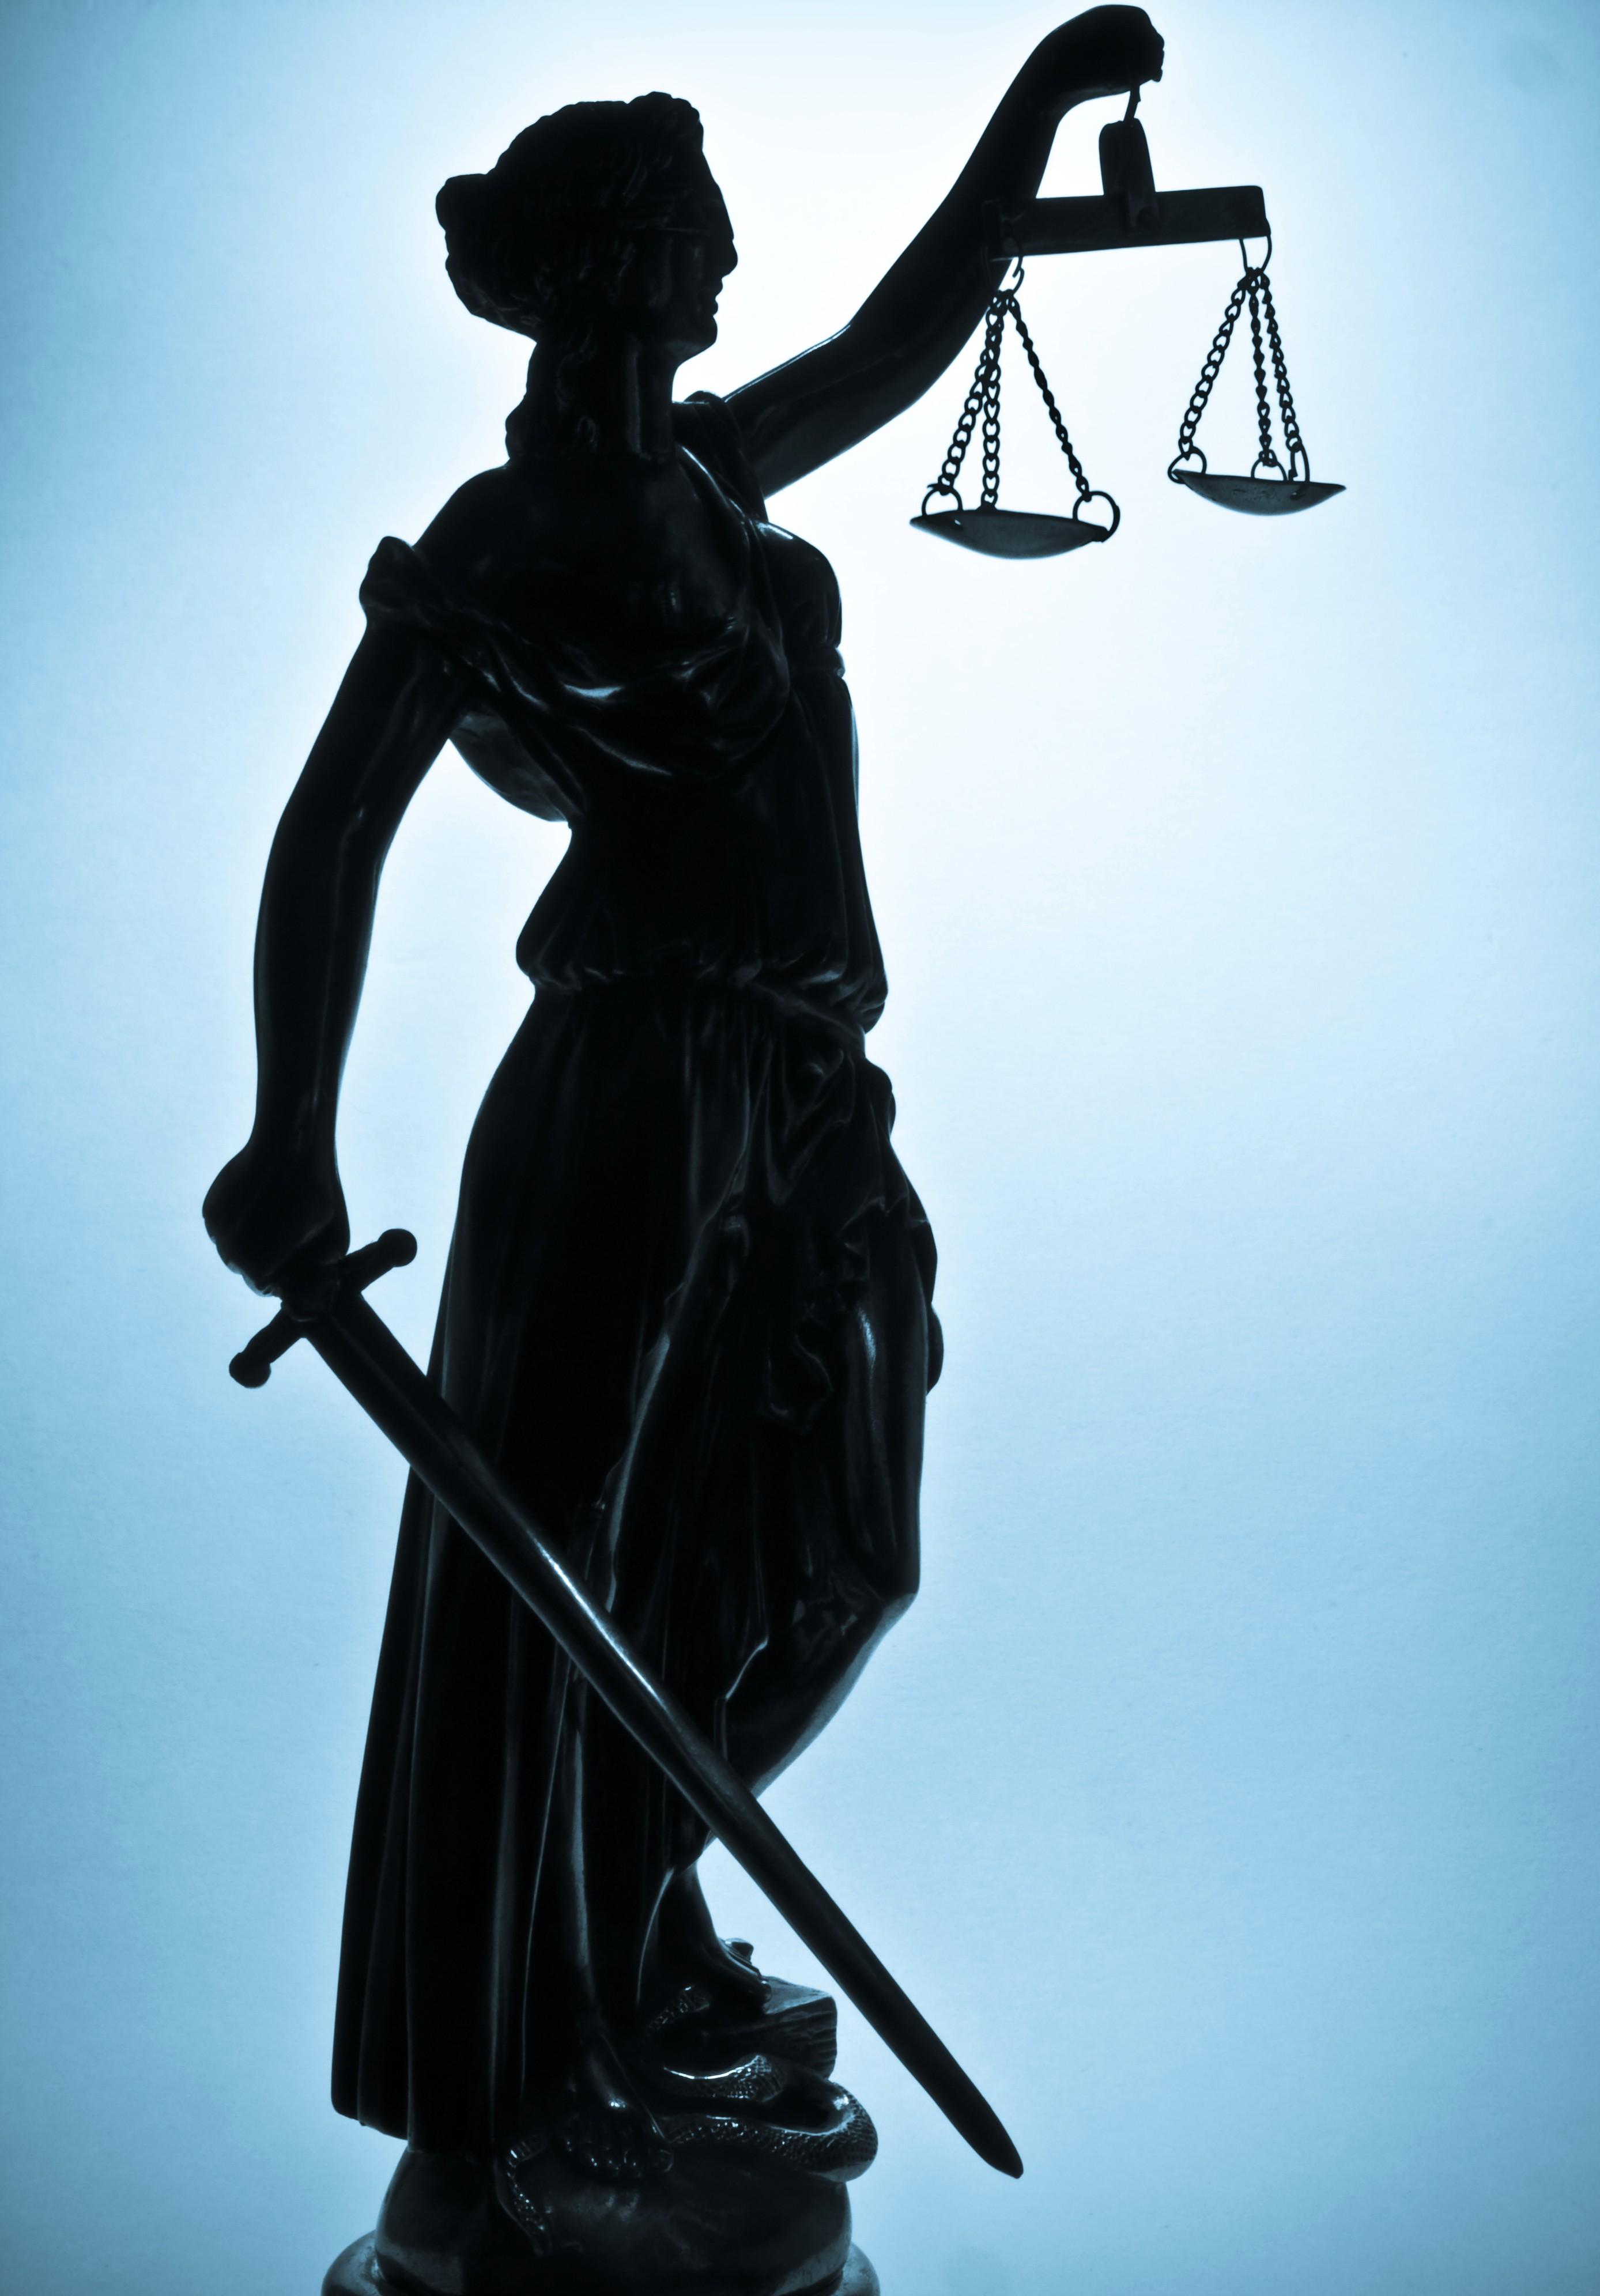 est100 一些攝影(some photos): Justitia, Law. 正義女神, 法律